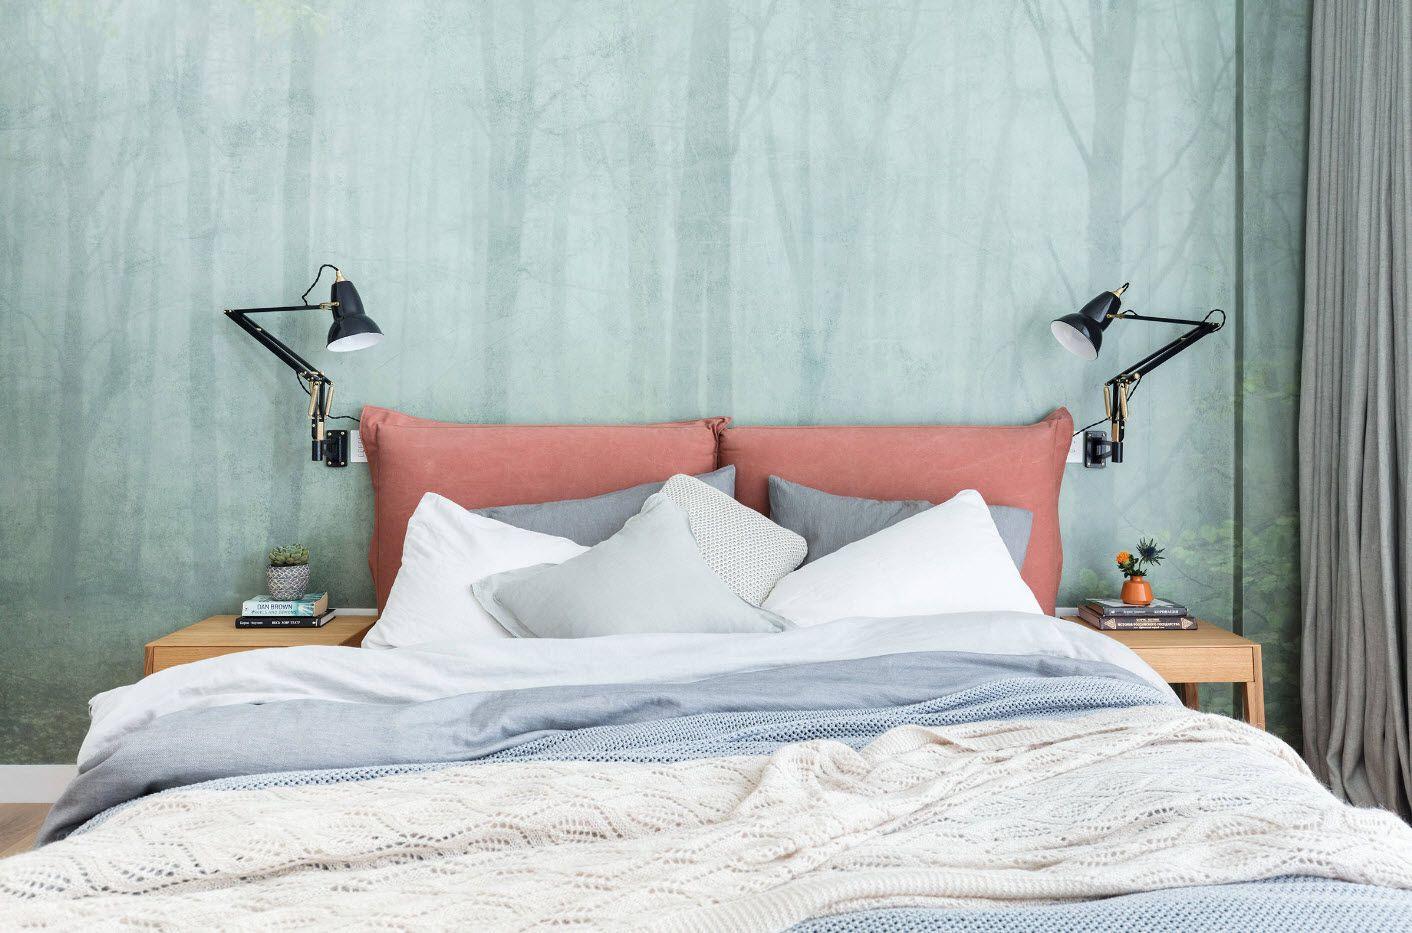 Modern Bedroom Interior Decoration & Design Ideas 2017. Built-in hi-tech lamps at the headboard